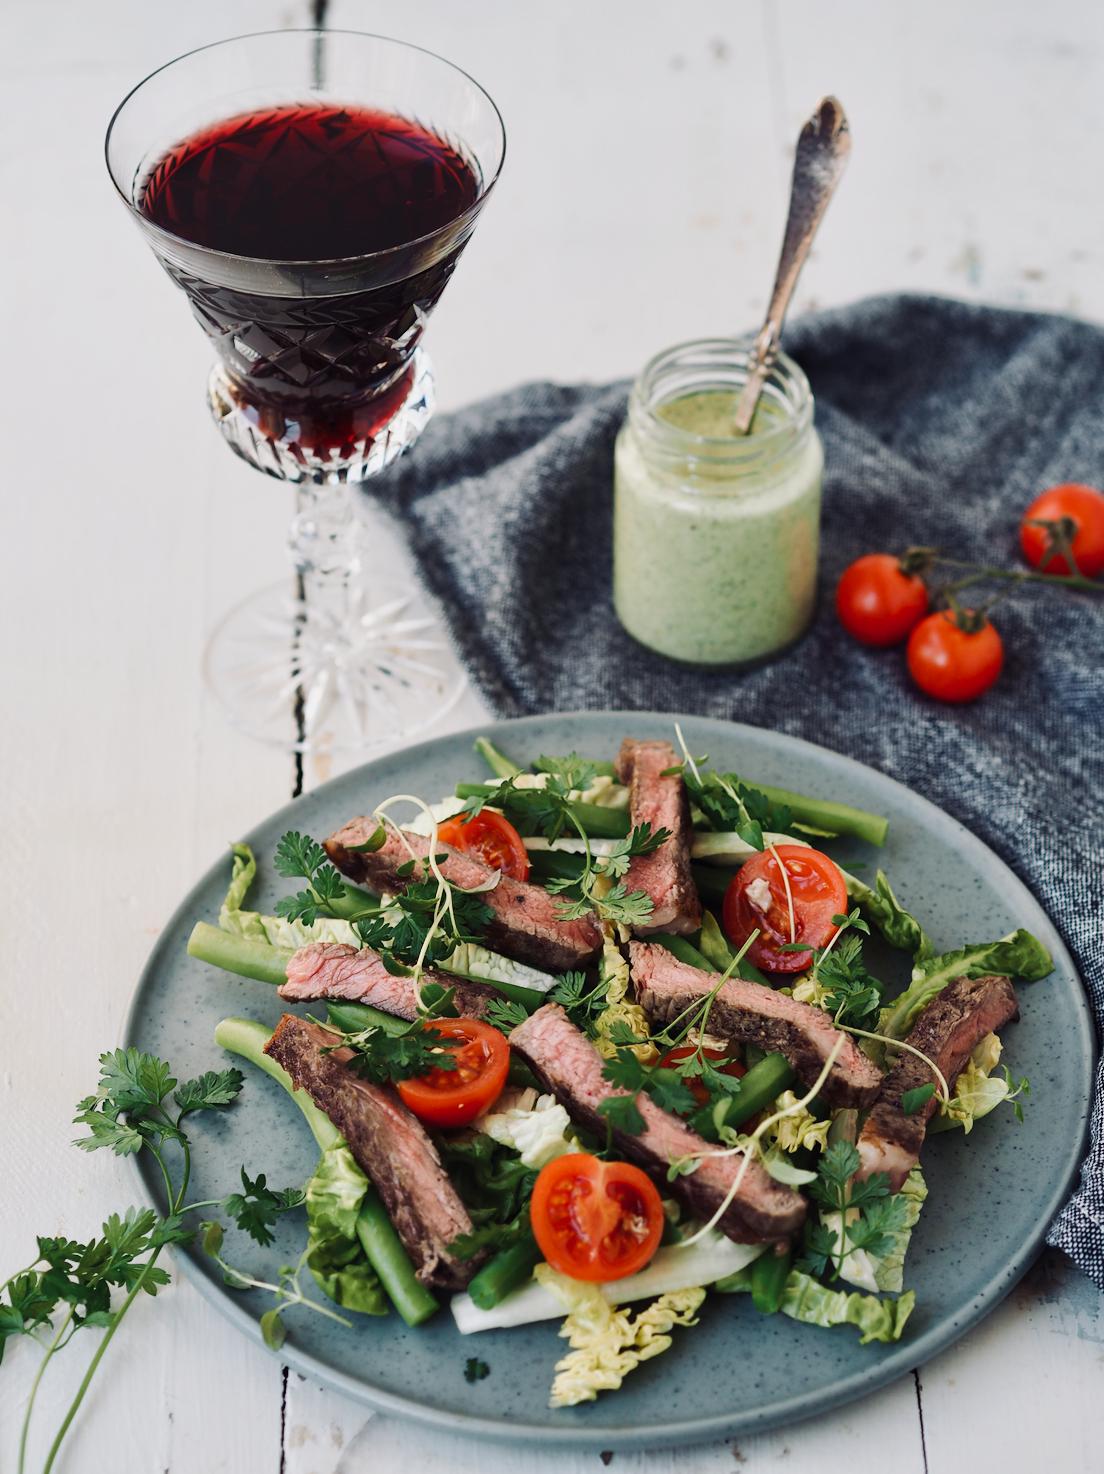 Steak salat med bønner, tomat og estragondressing